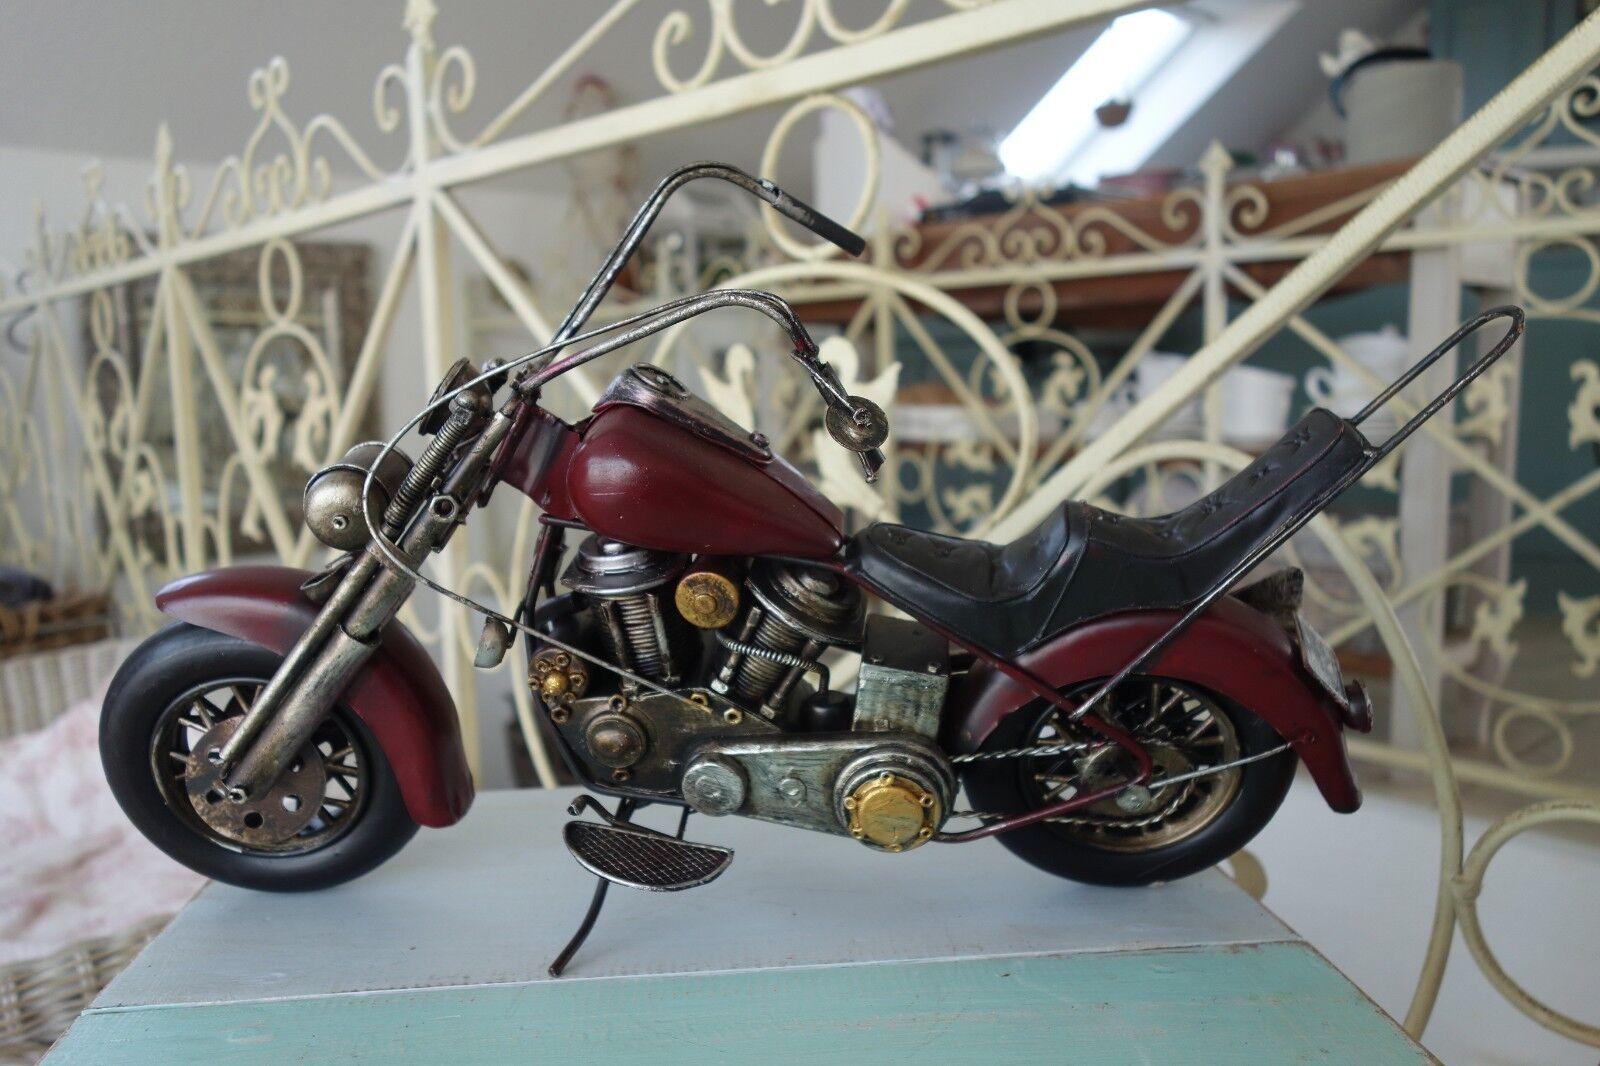 Nostalgie Motorrad Schopper Blechfahrzeug Dekoration Retro-Stil 24x 41 x12cm NEU